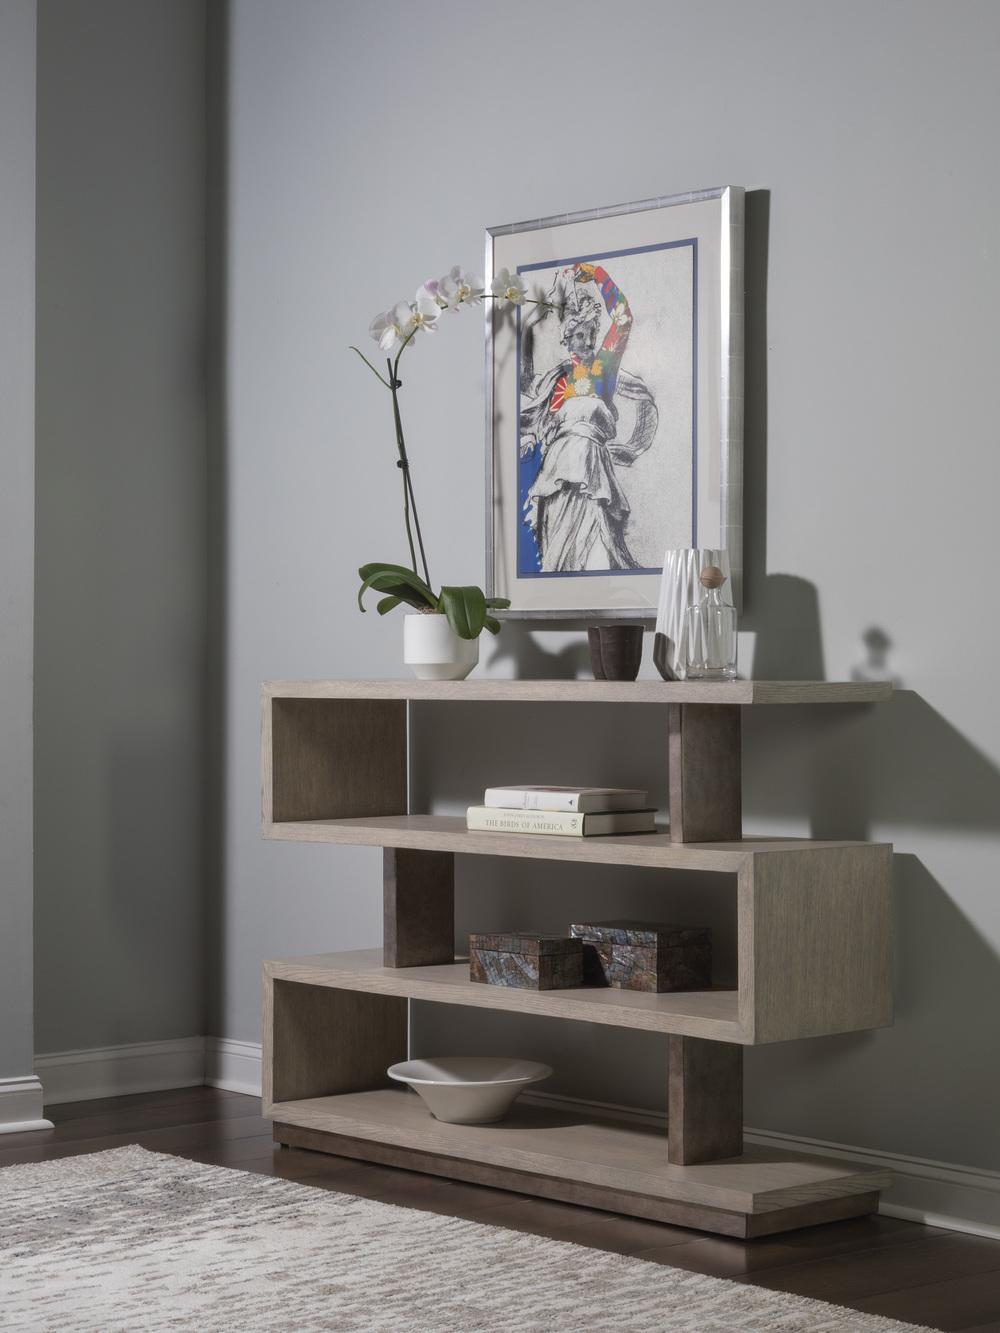 Artistica Home - Soiree Low Bookcase